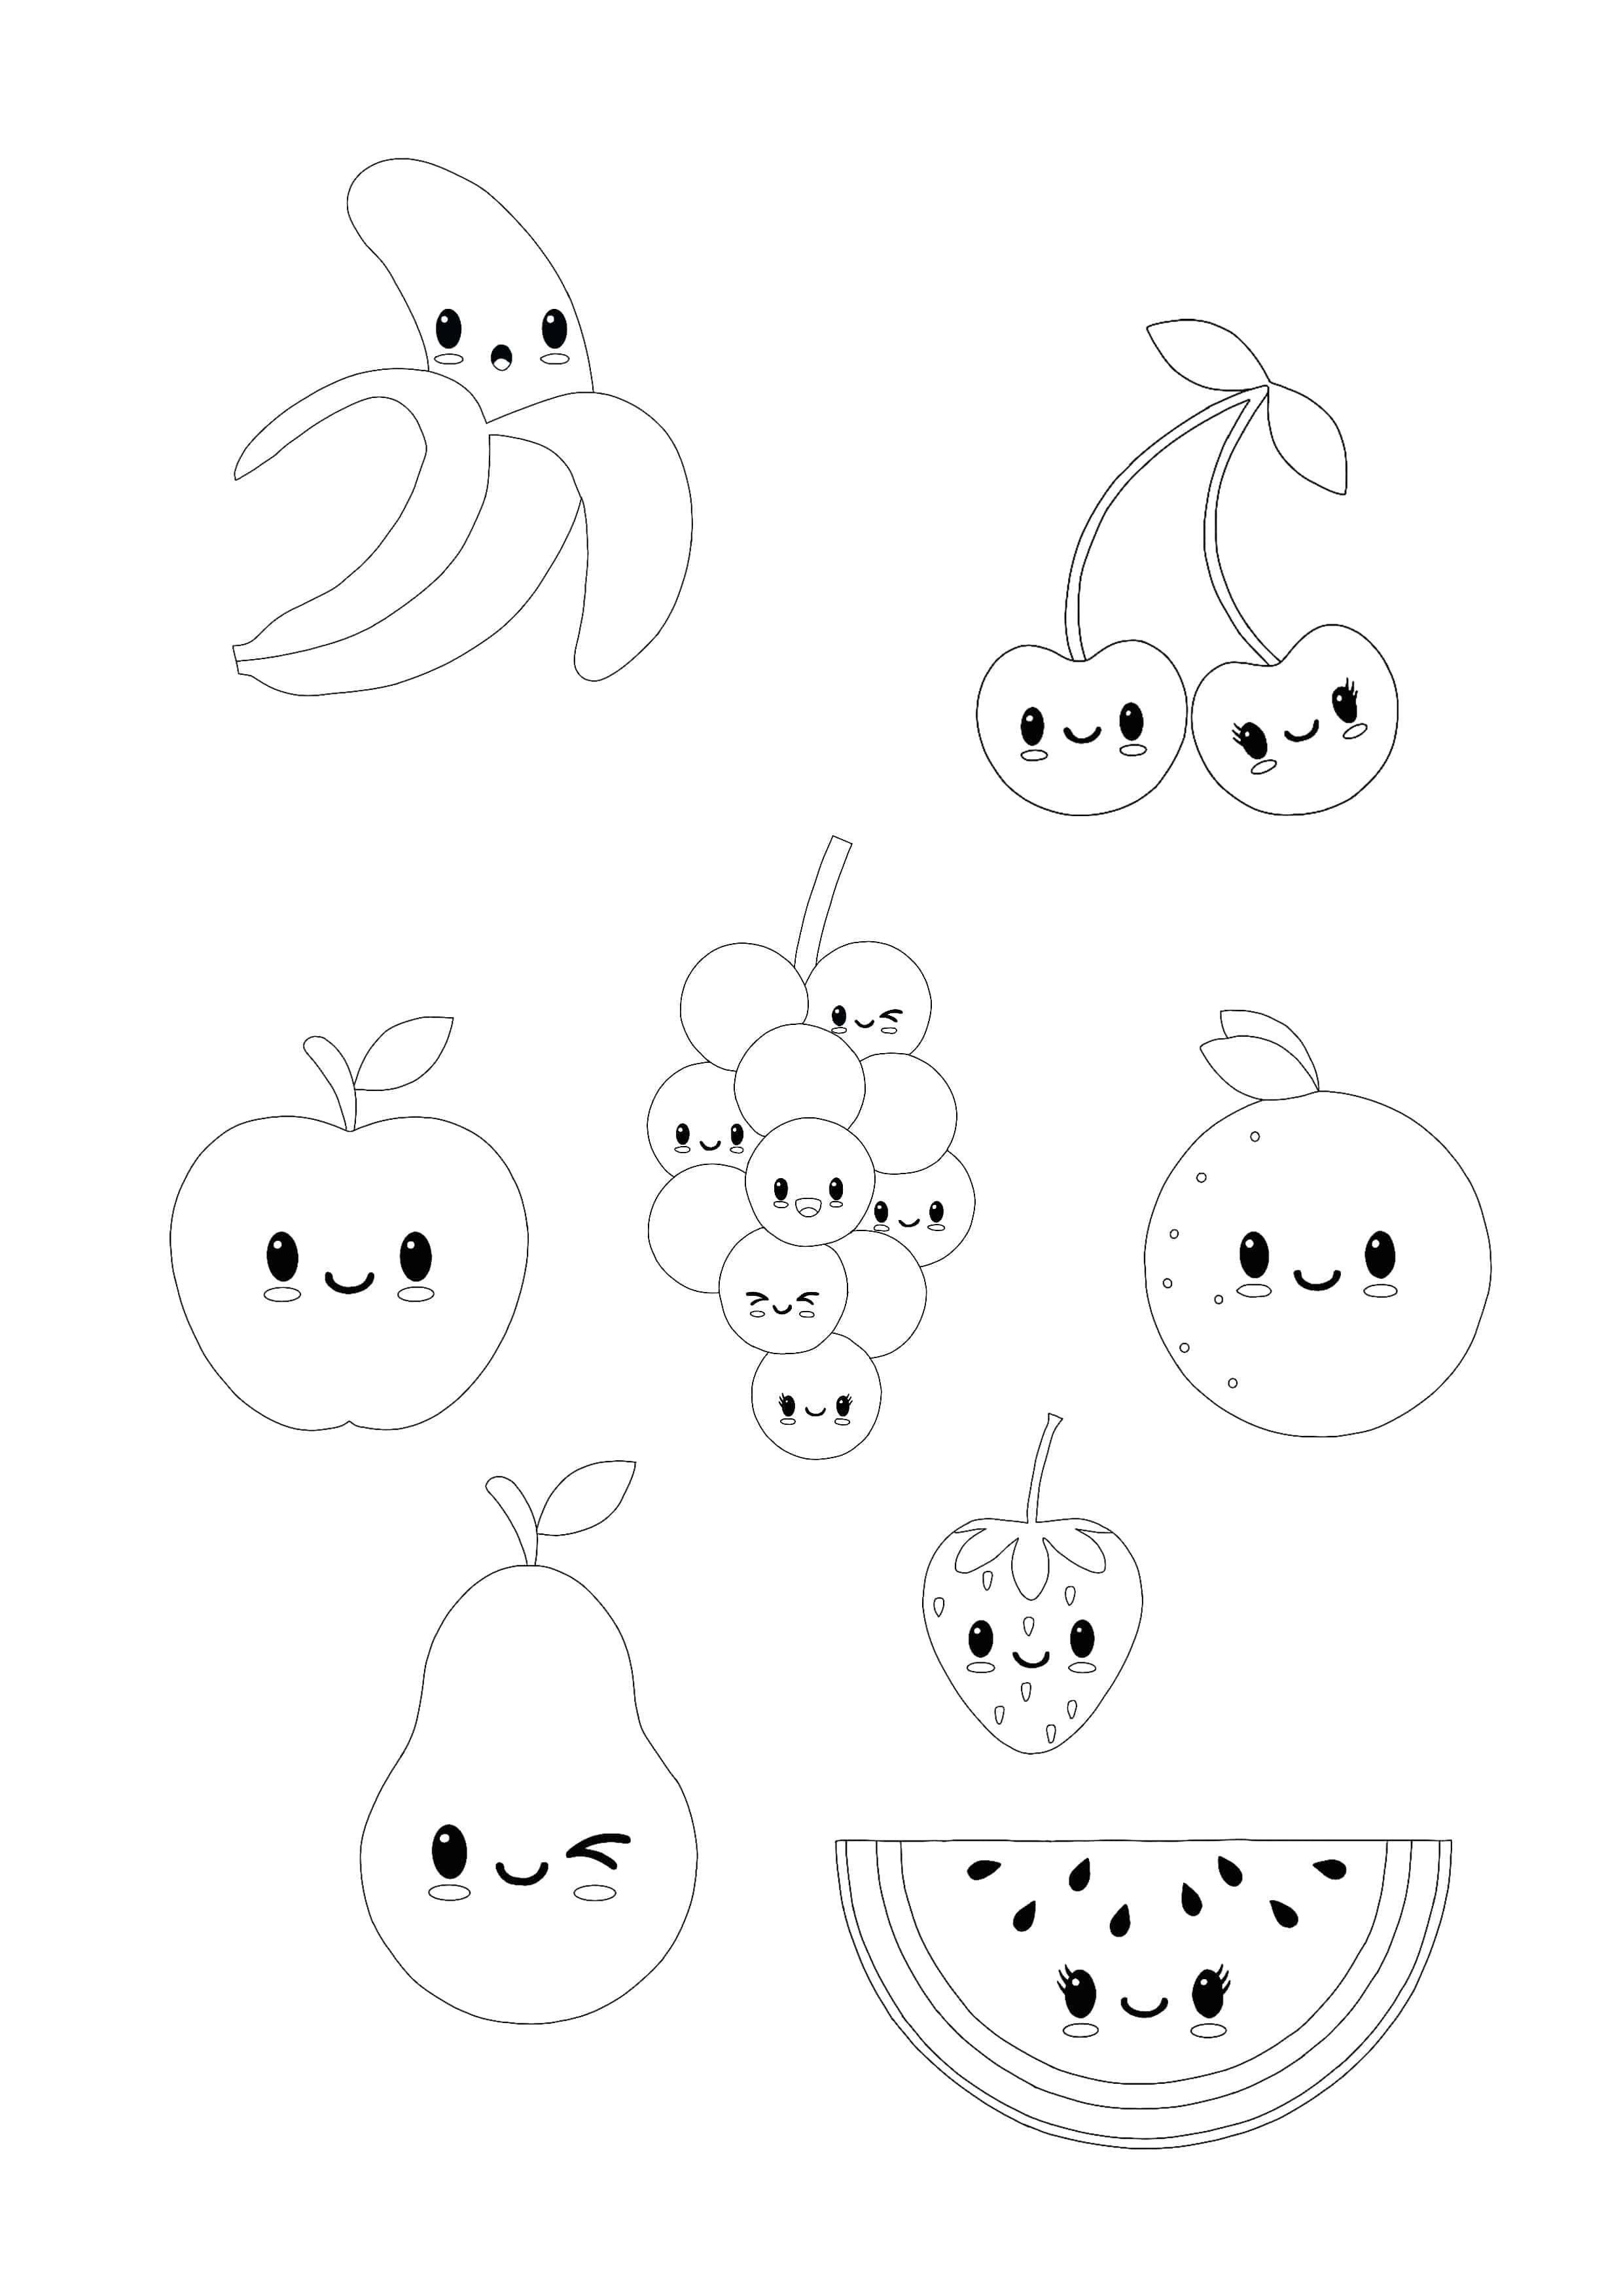 Kawaii Fruits Coloring Page Kawaii Fruit Coloring Pages Fruit Coloring Pages